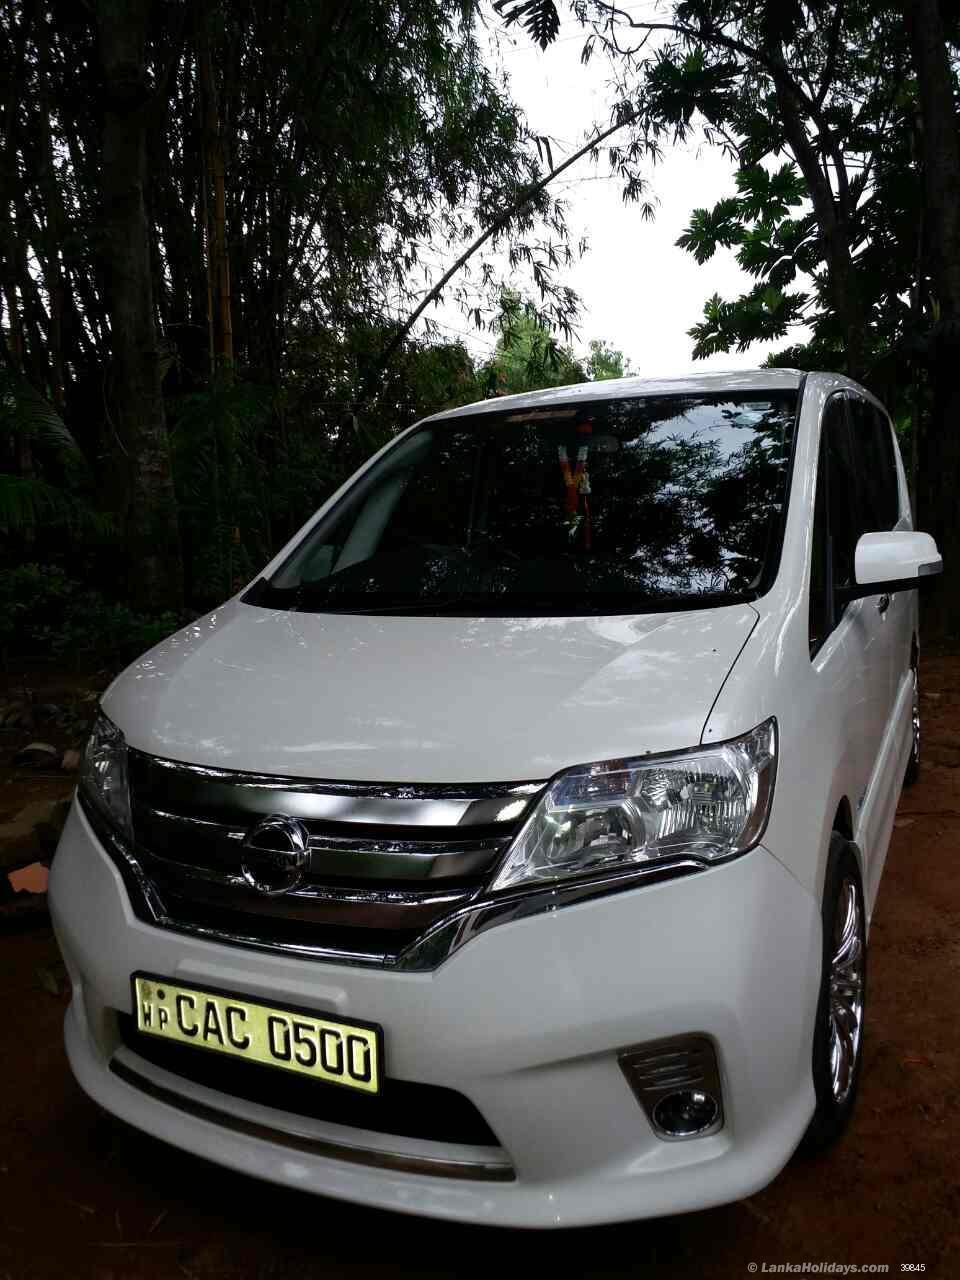 Types Of Jeeps >> Sri Lanka Van Rentals/Hire - Toyota Voxy Luxury SUV for hire